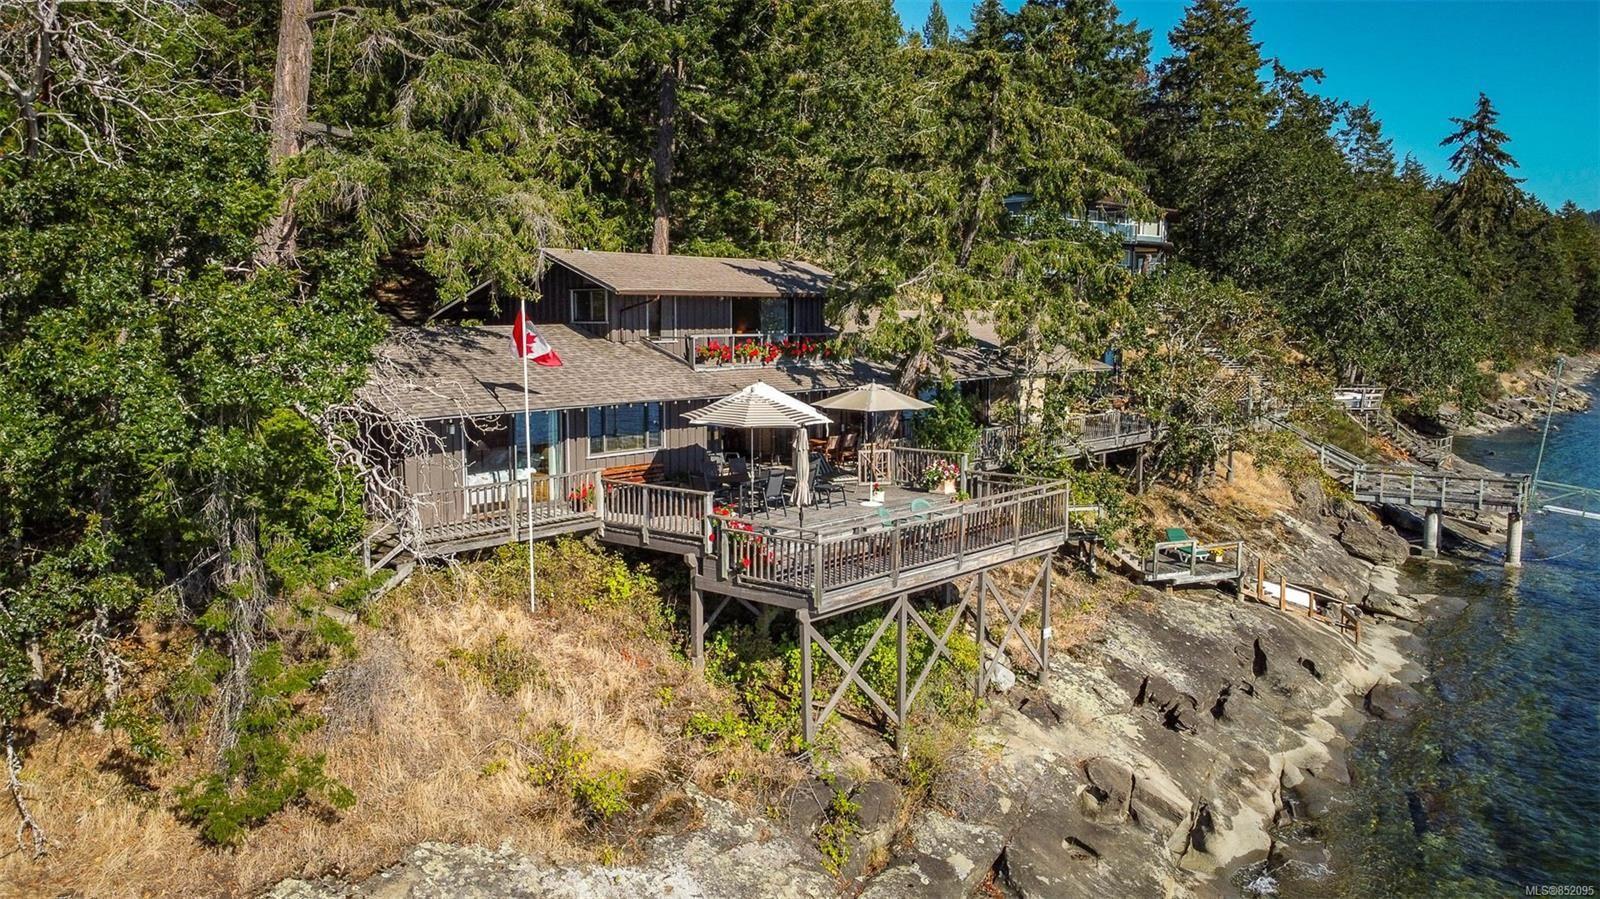 Photo 33: Photos: 236 McGill Rd in : GI Salt Spring House for sale (Gulf Islands)  : MLS®# 852095